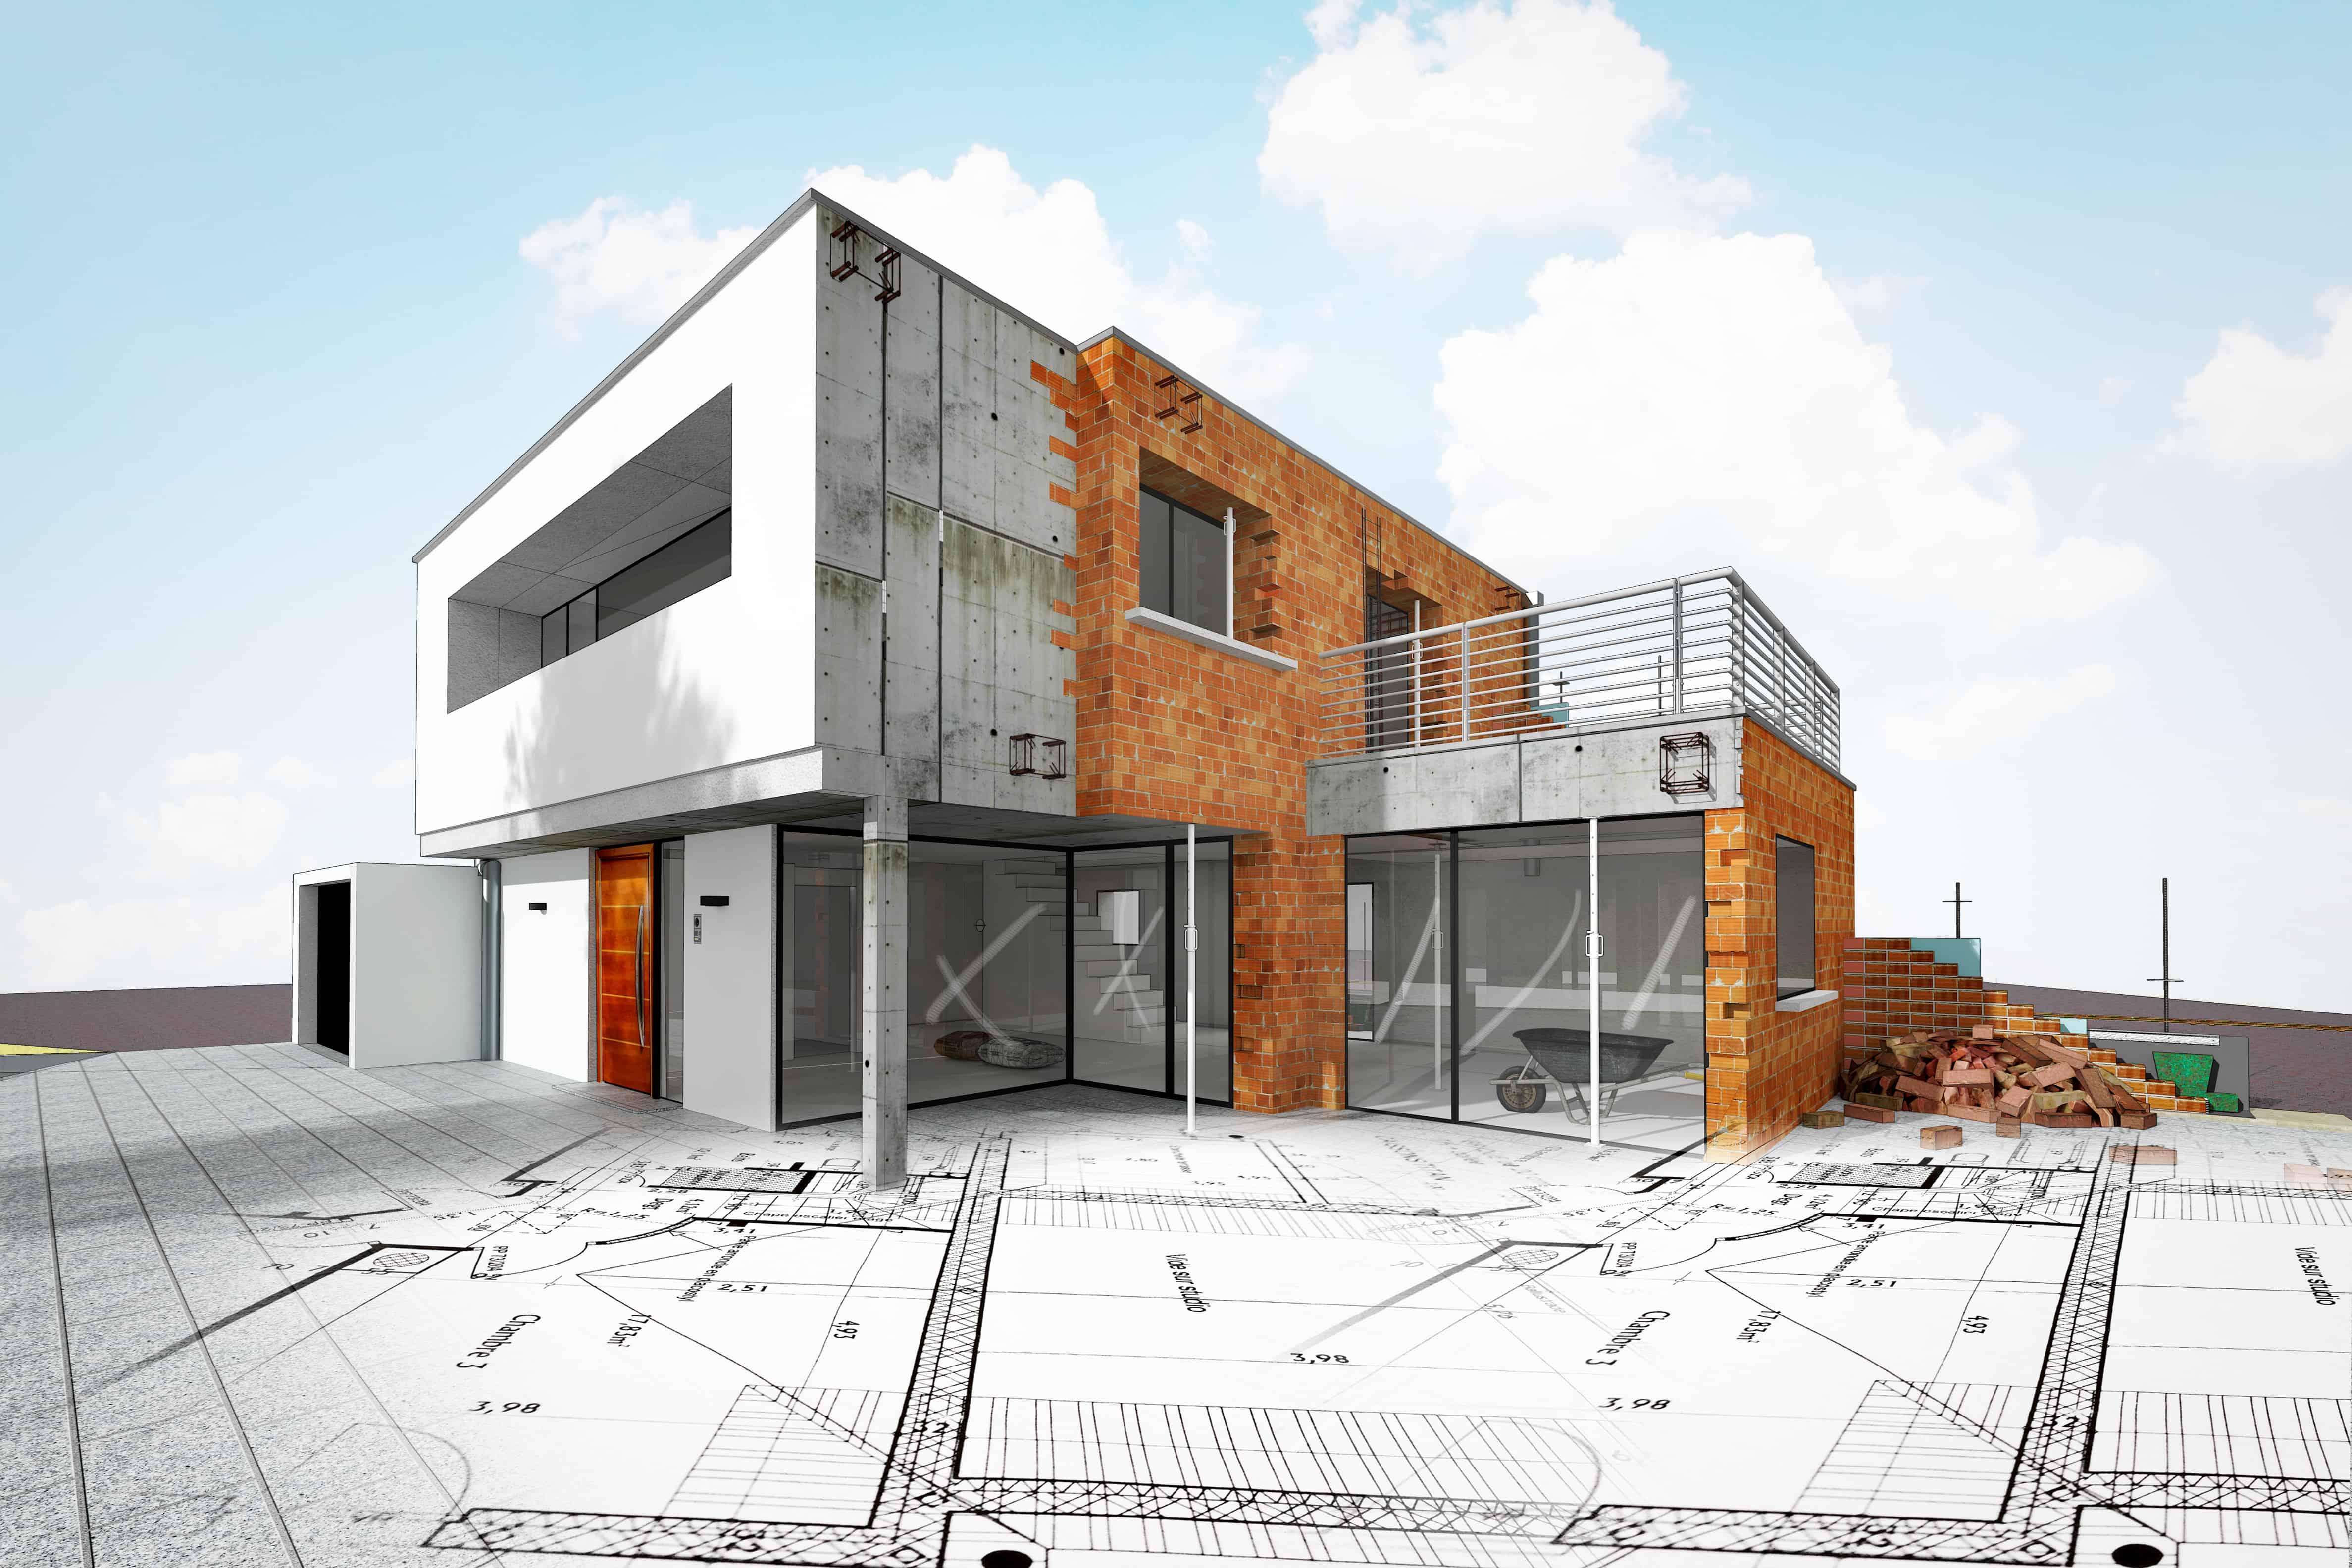 Bauplanung Hausbau